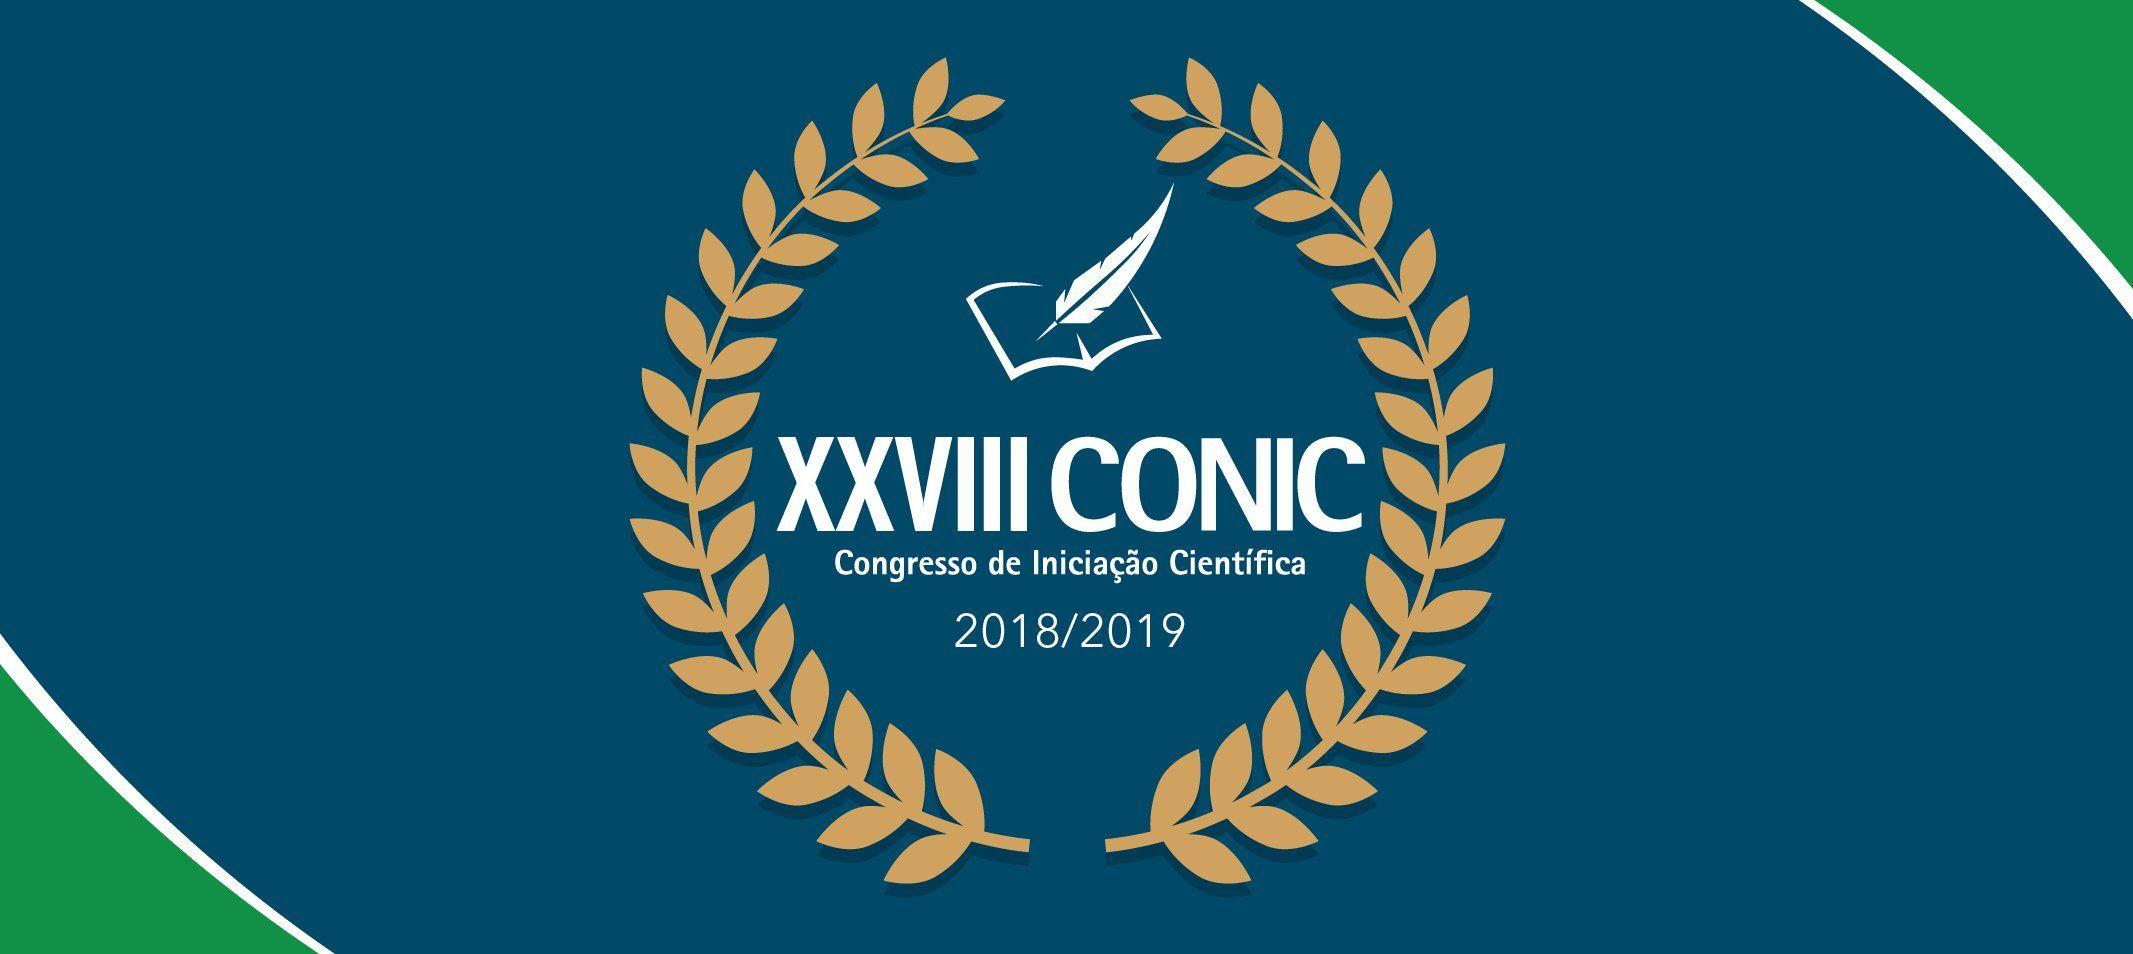 Propesp promove XXVIII Conic no período de 14 a 16 de outubro